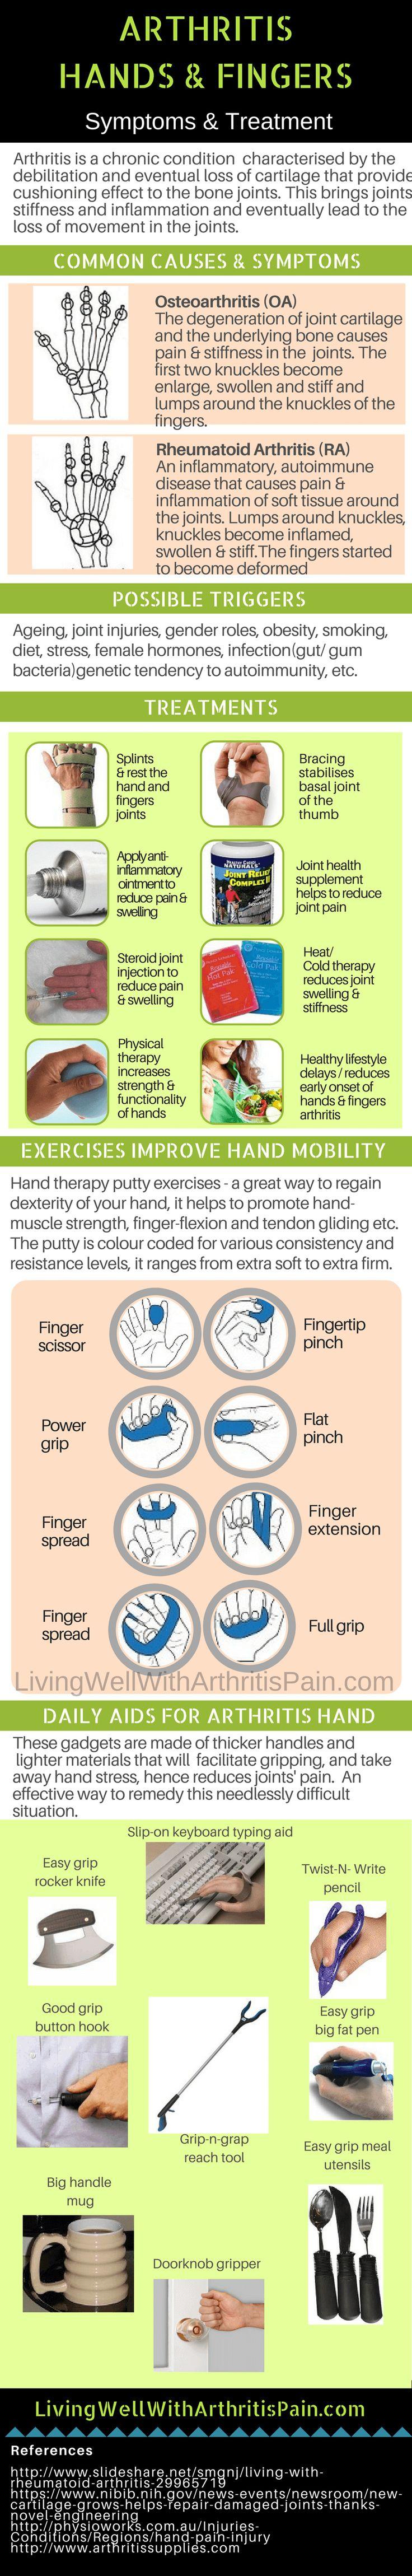 Arthritis Hands & Fingers – Symptoms & Treatment - Living Well With Arthritis Pain